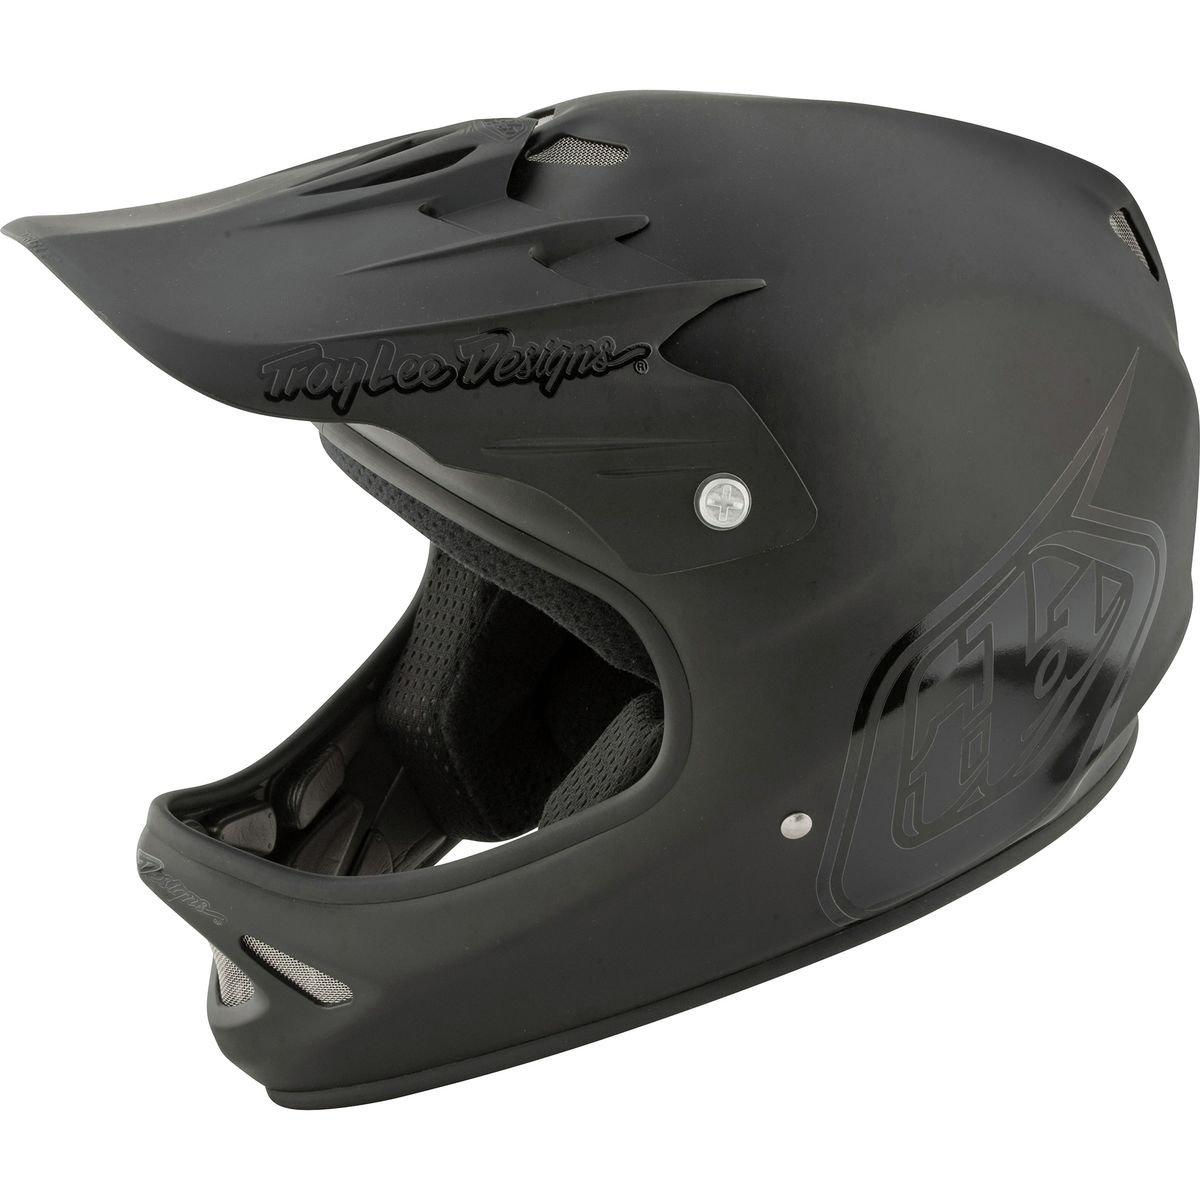 Troy Lee Designs Midnight 3成人用D2バイクスポーツBMXヘルメット - ブラック/ミディアム/ラージ   B06XD2JWB5